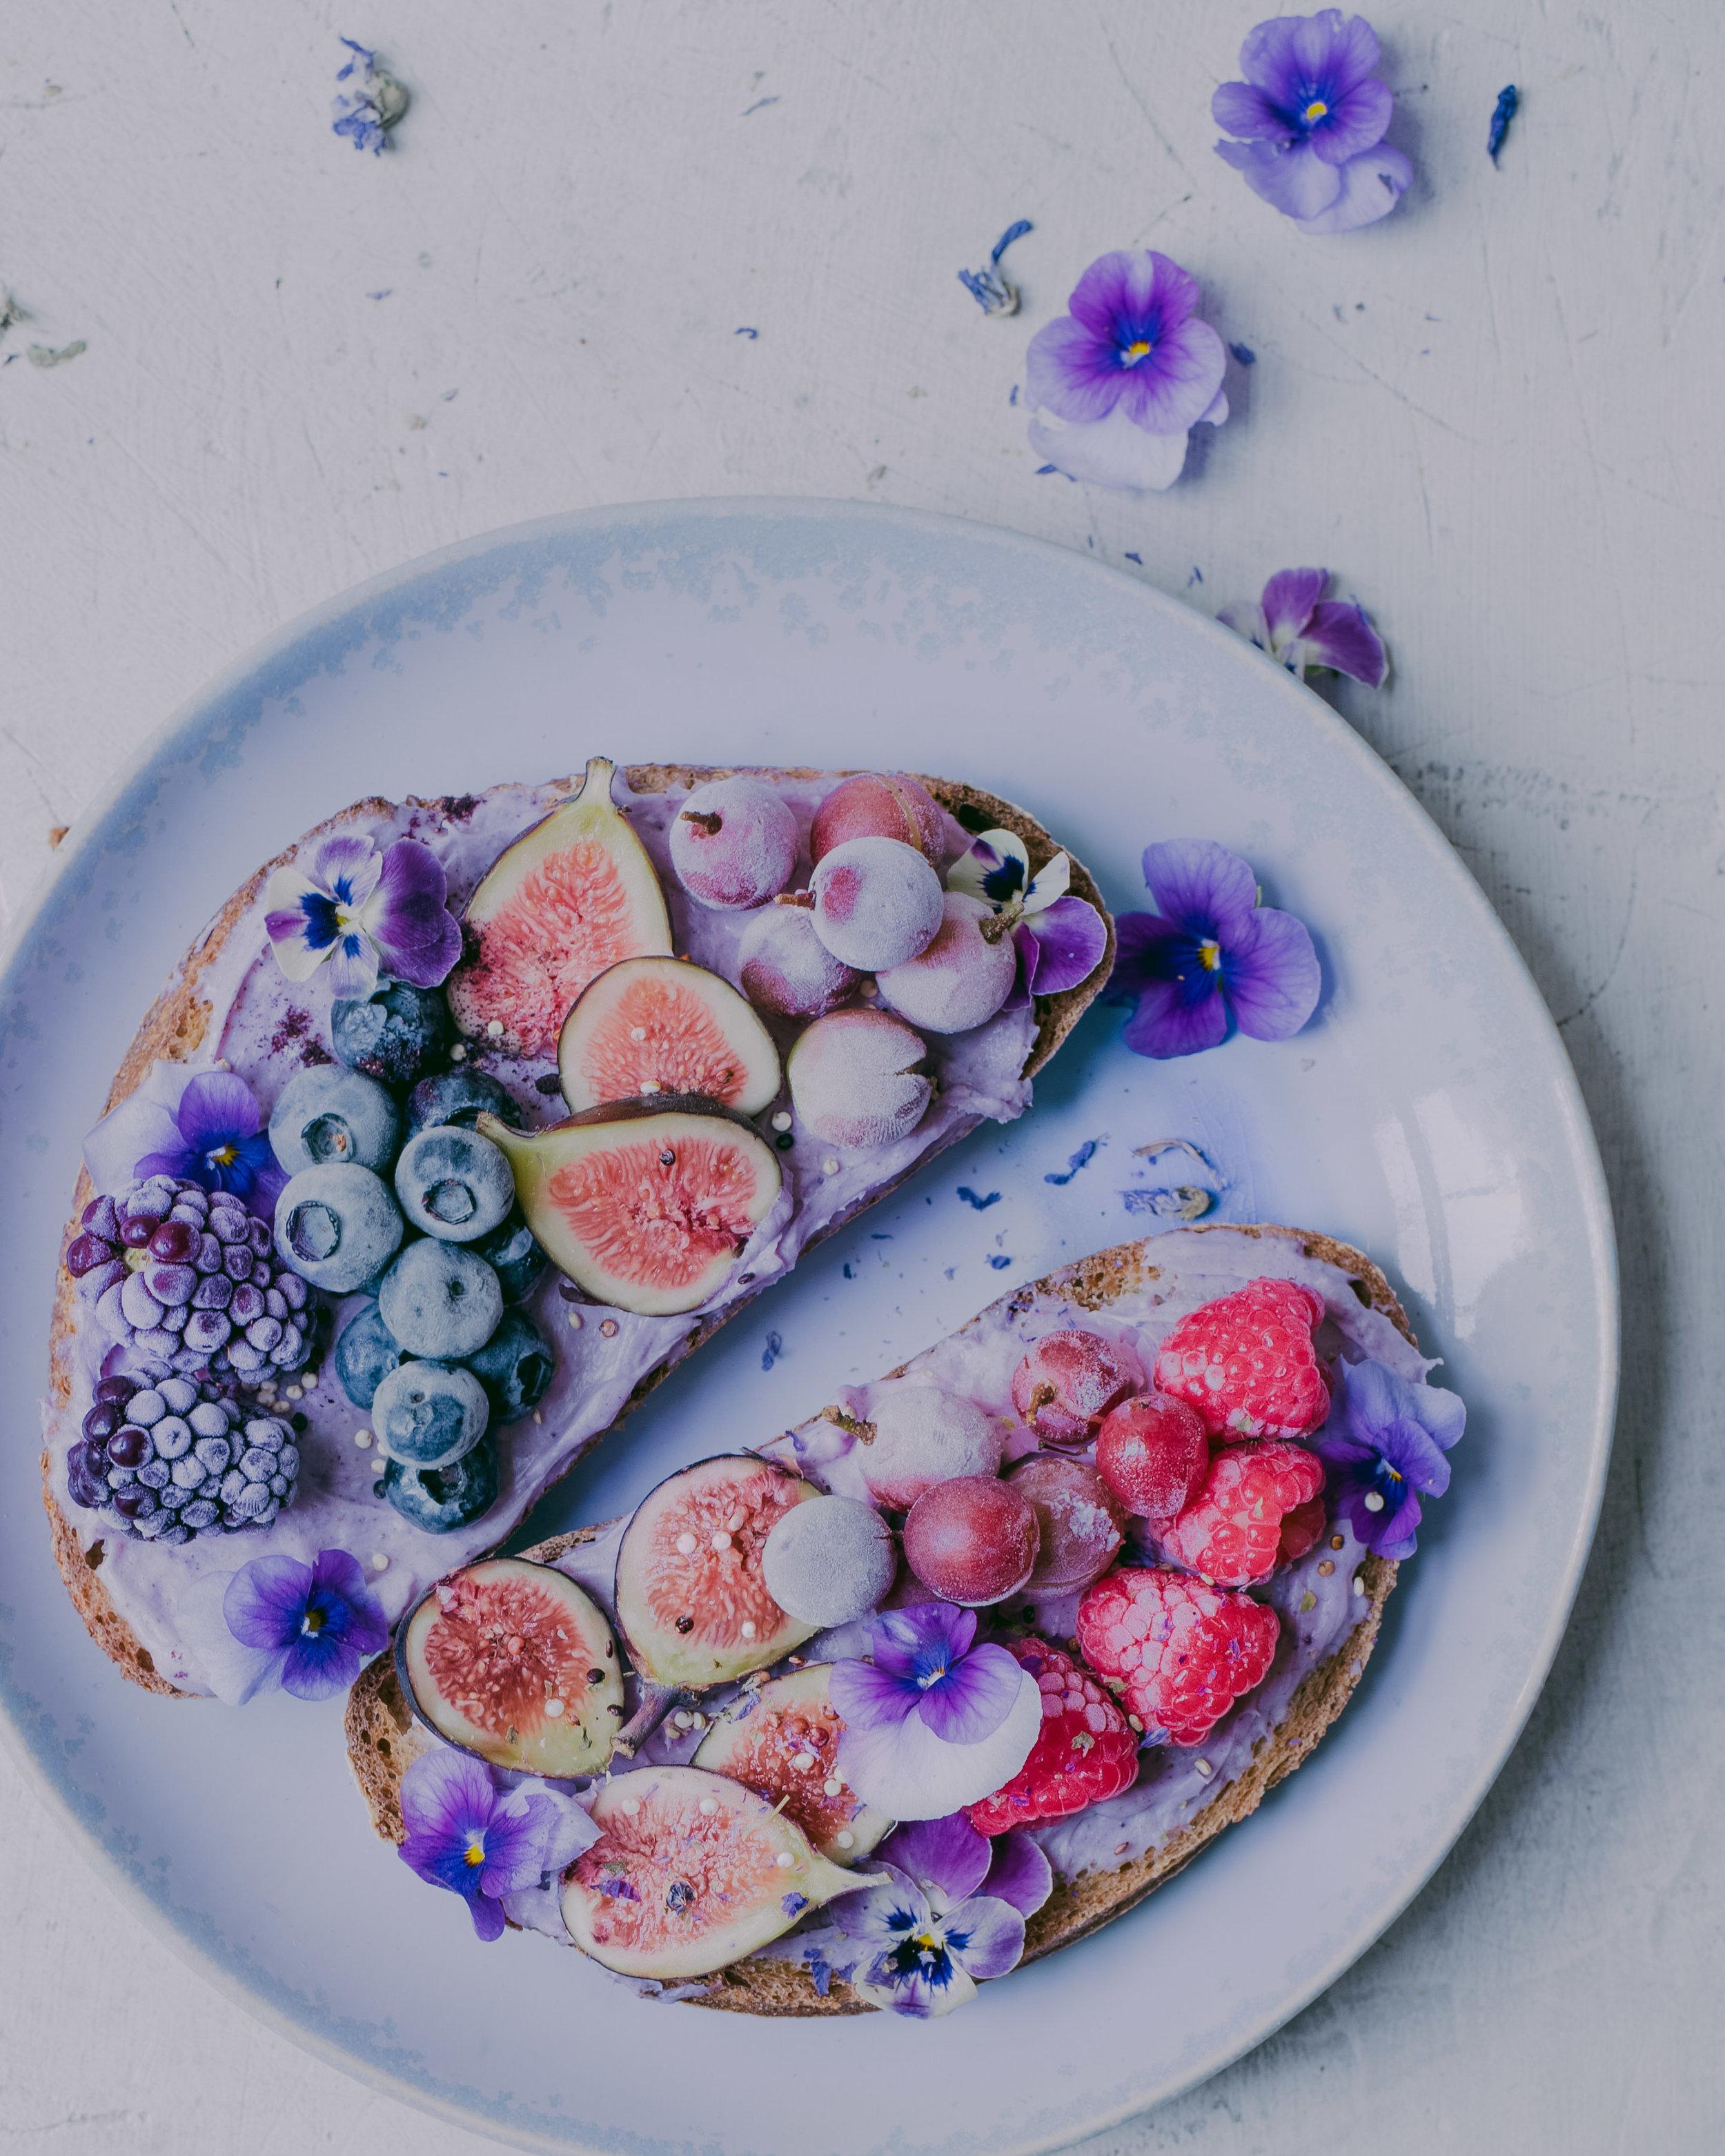 Blueberry Cream Cheese Toast - Vegan